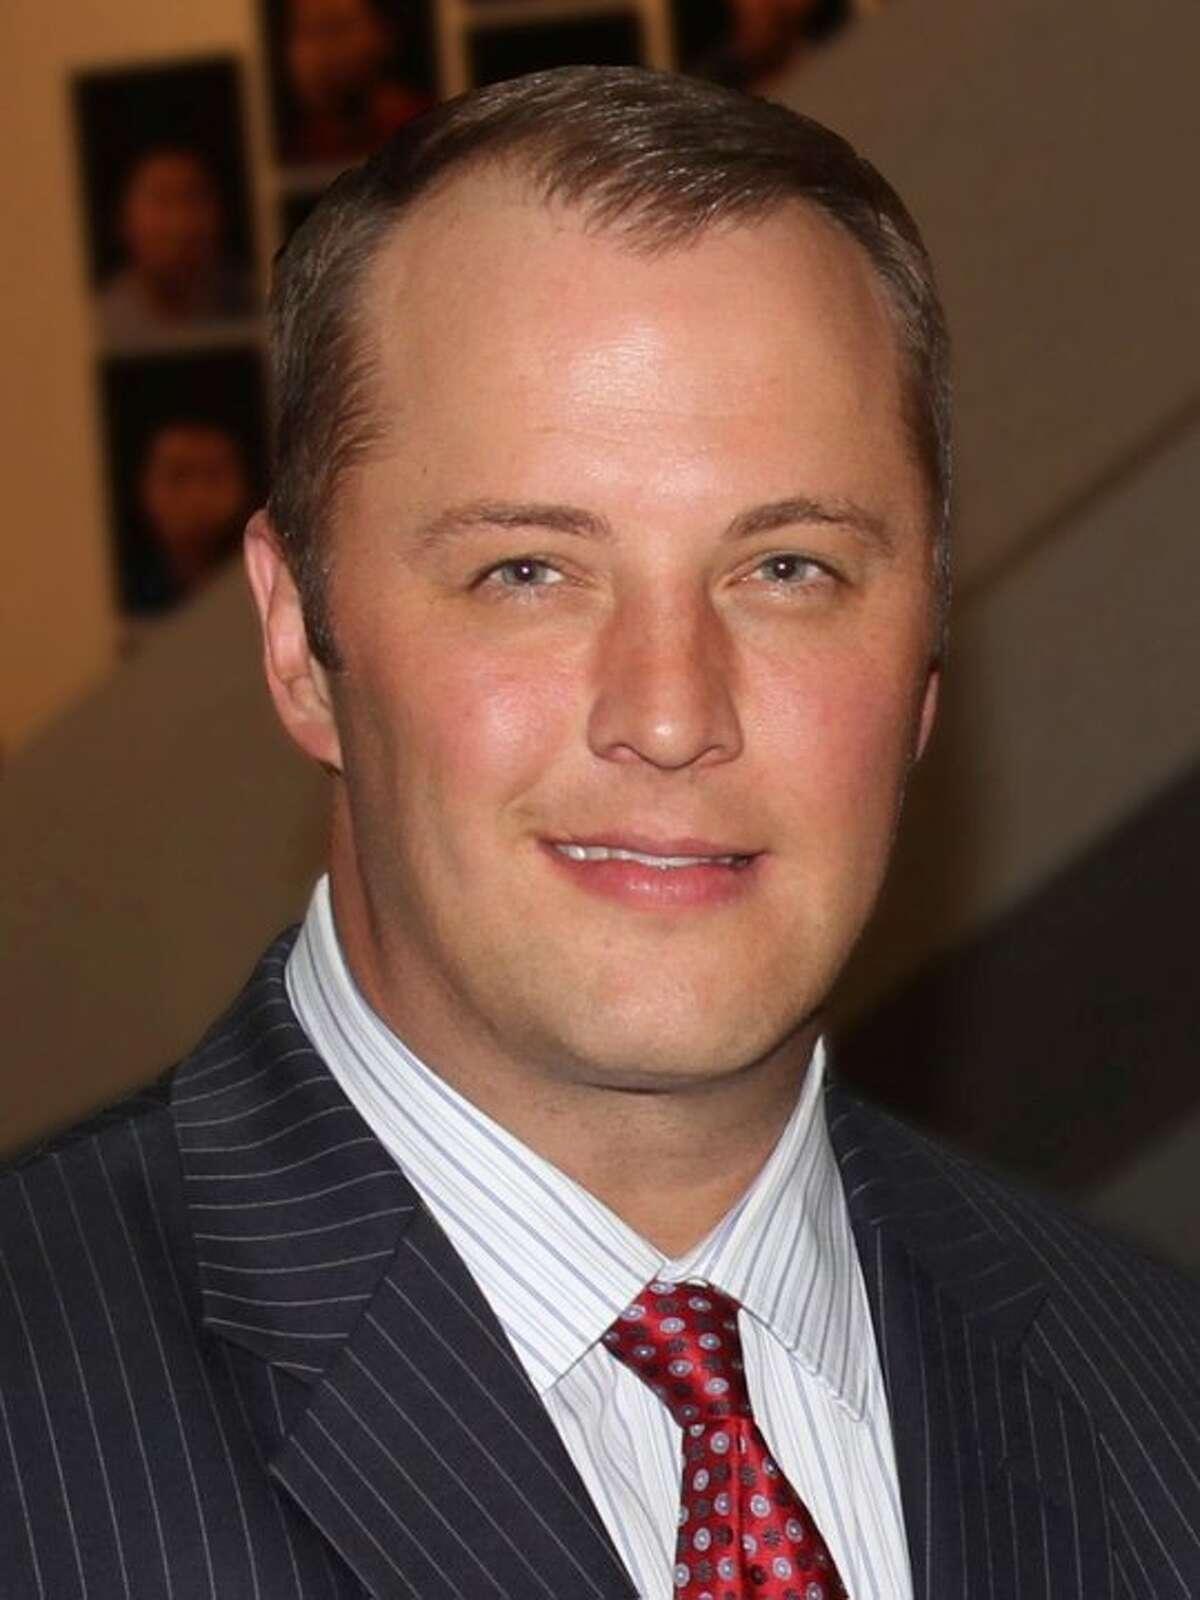 Ed Longanecker, president of TIPRO